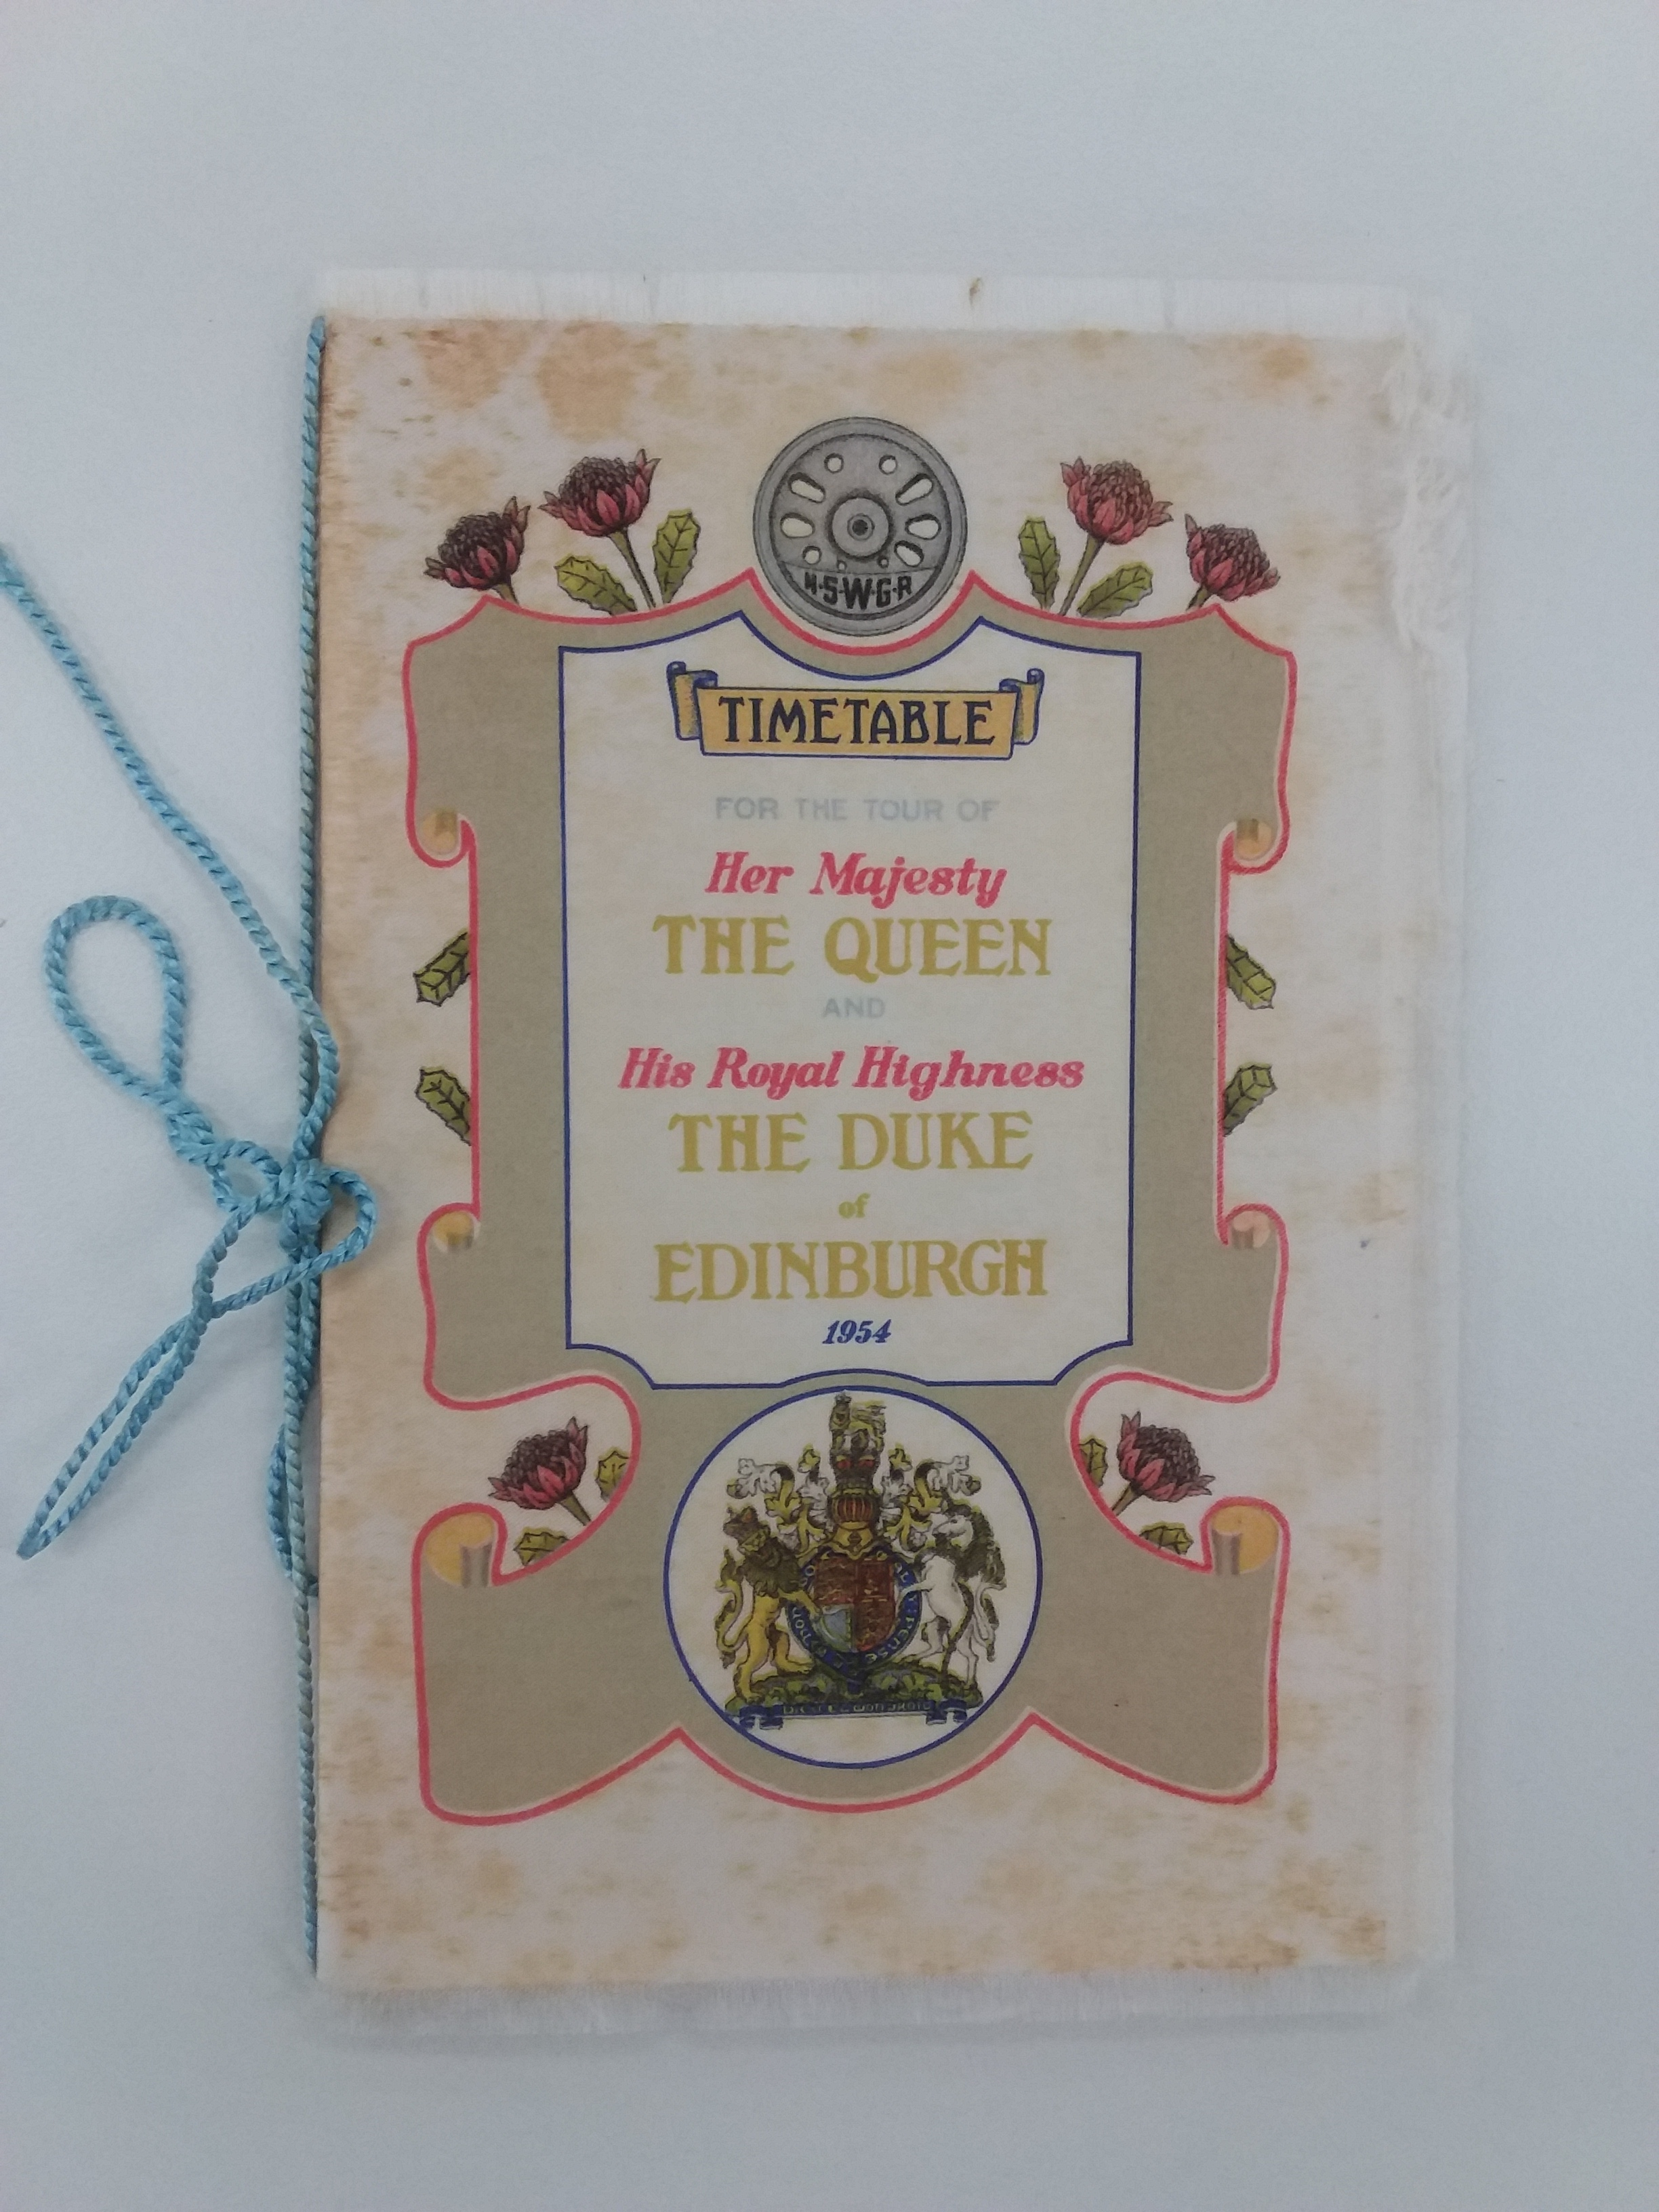 Photo of the Royal visit commemorative silk train timetable